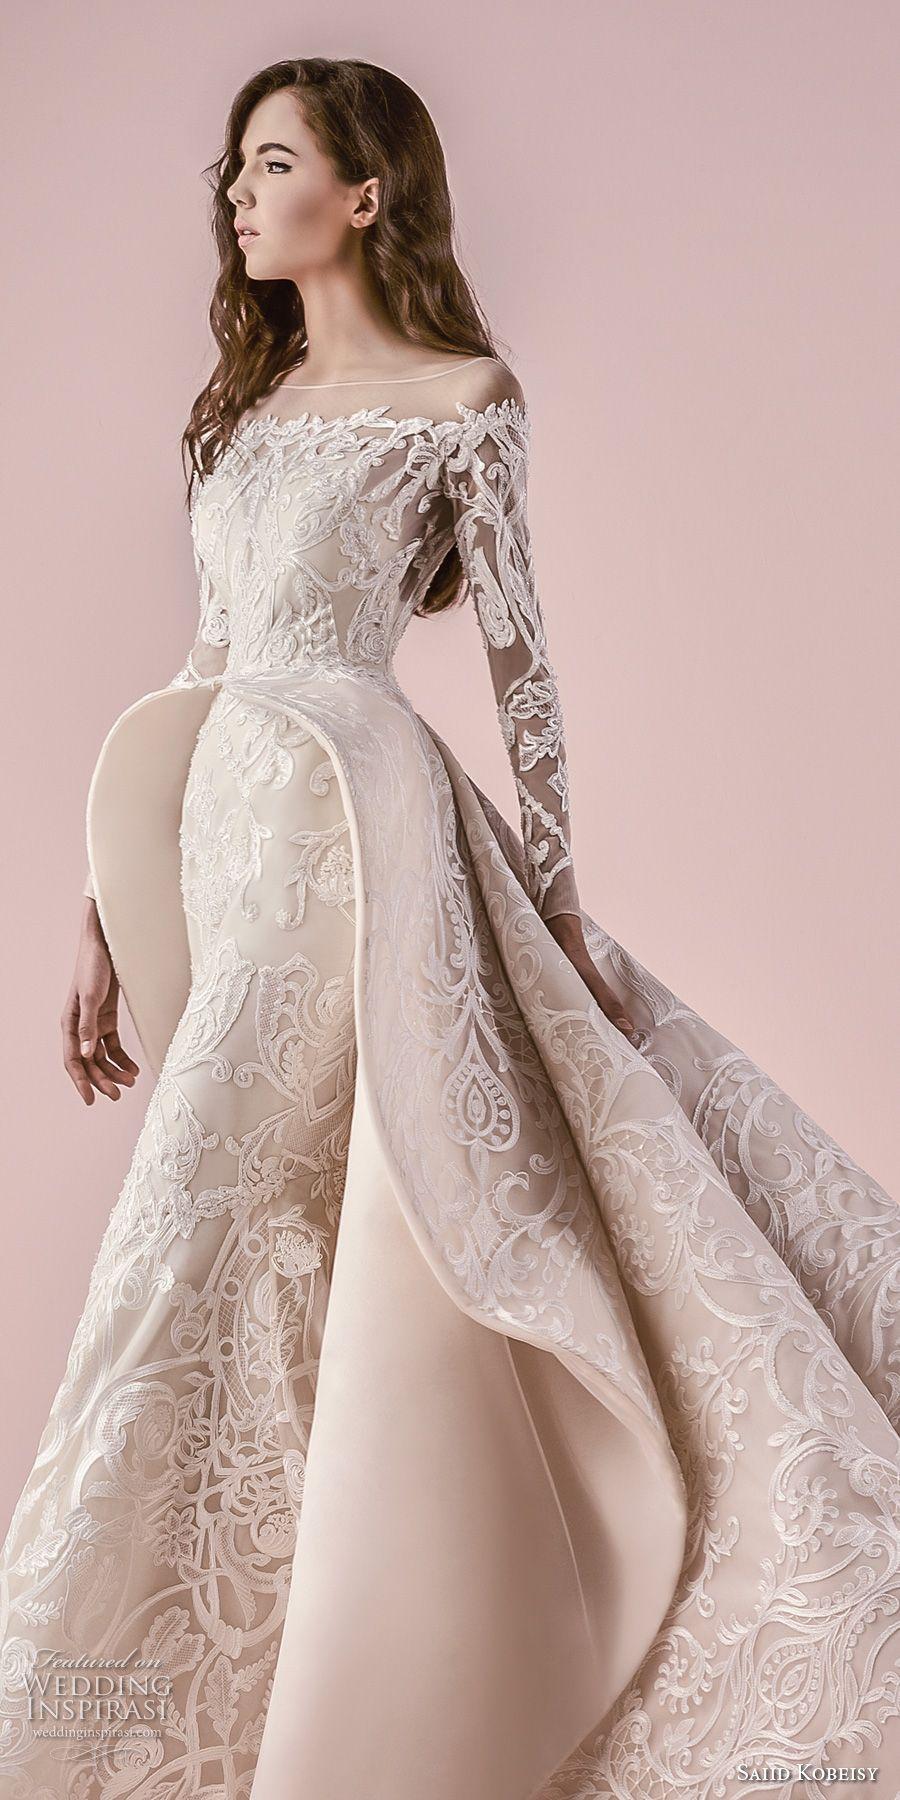 Peplum Dress 2018